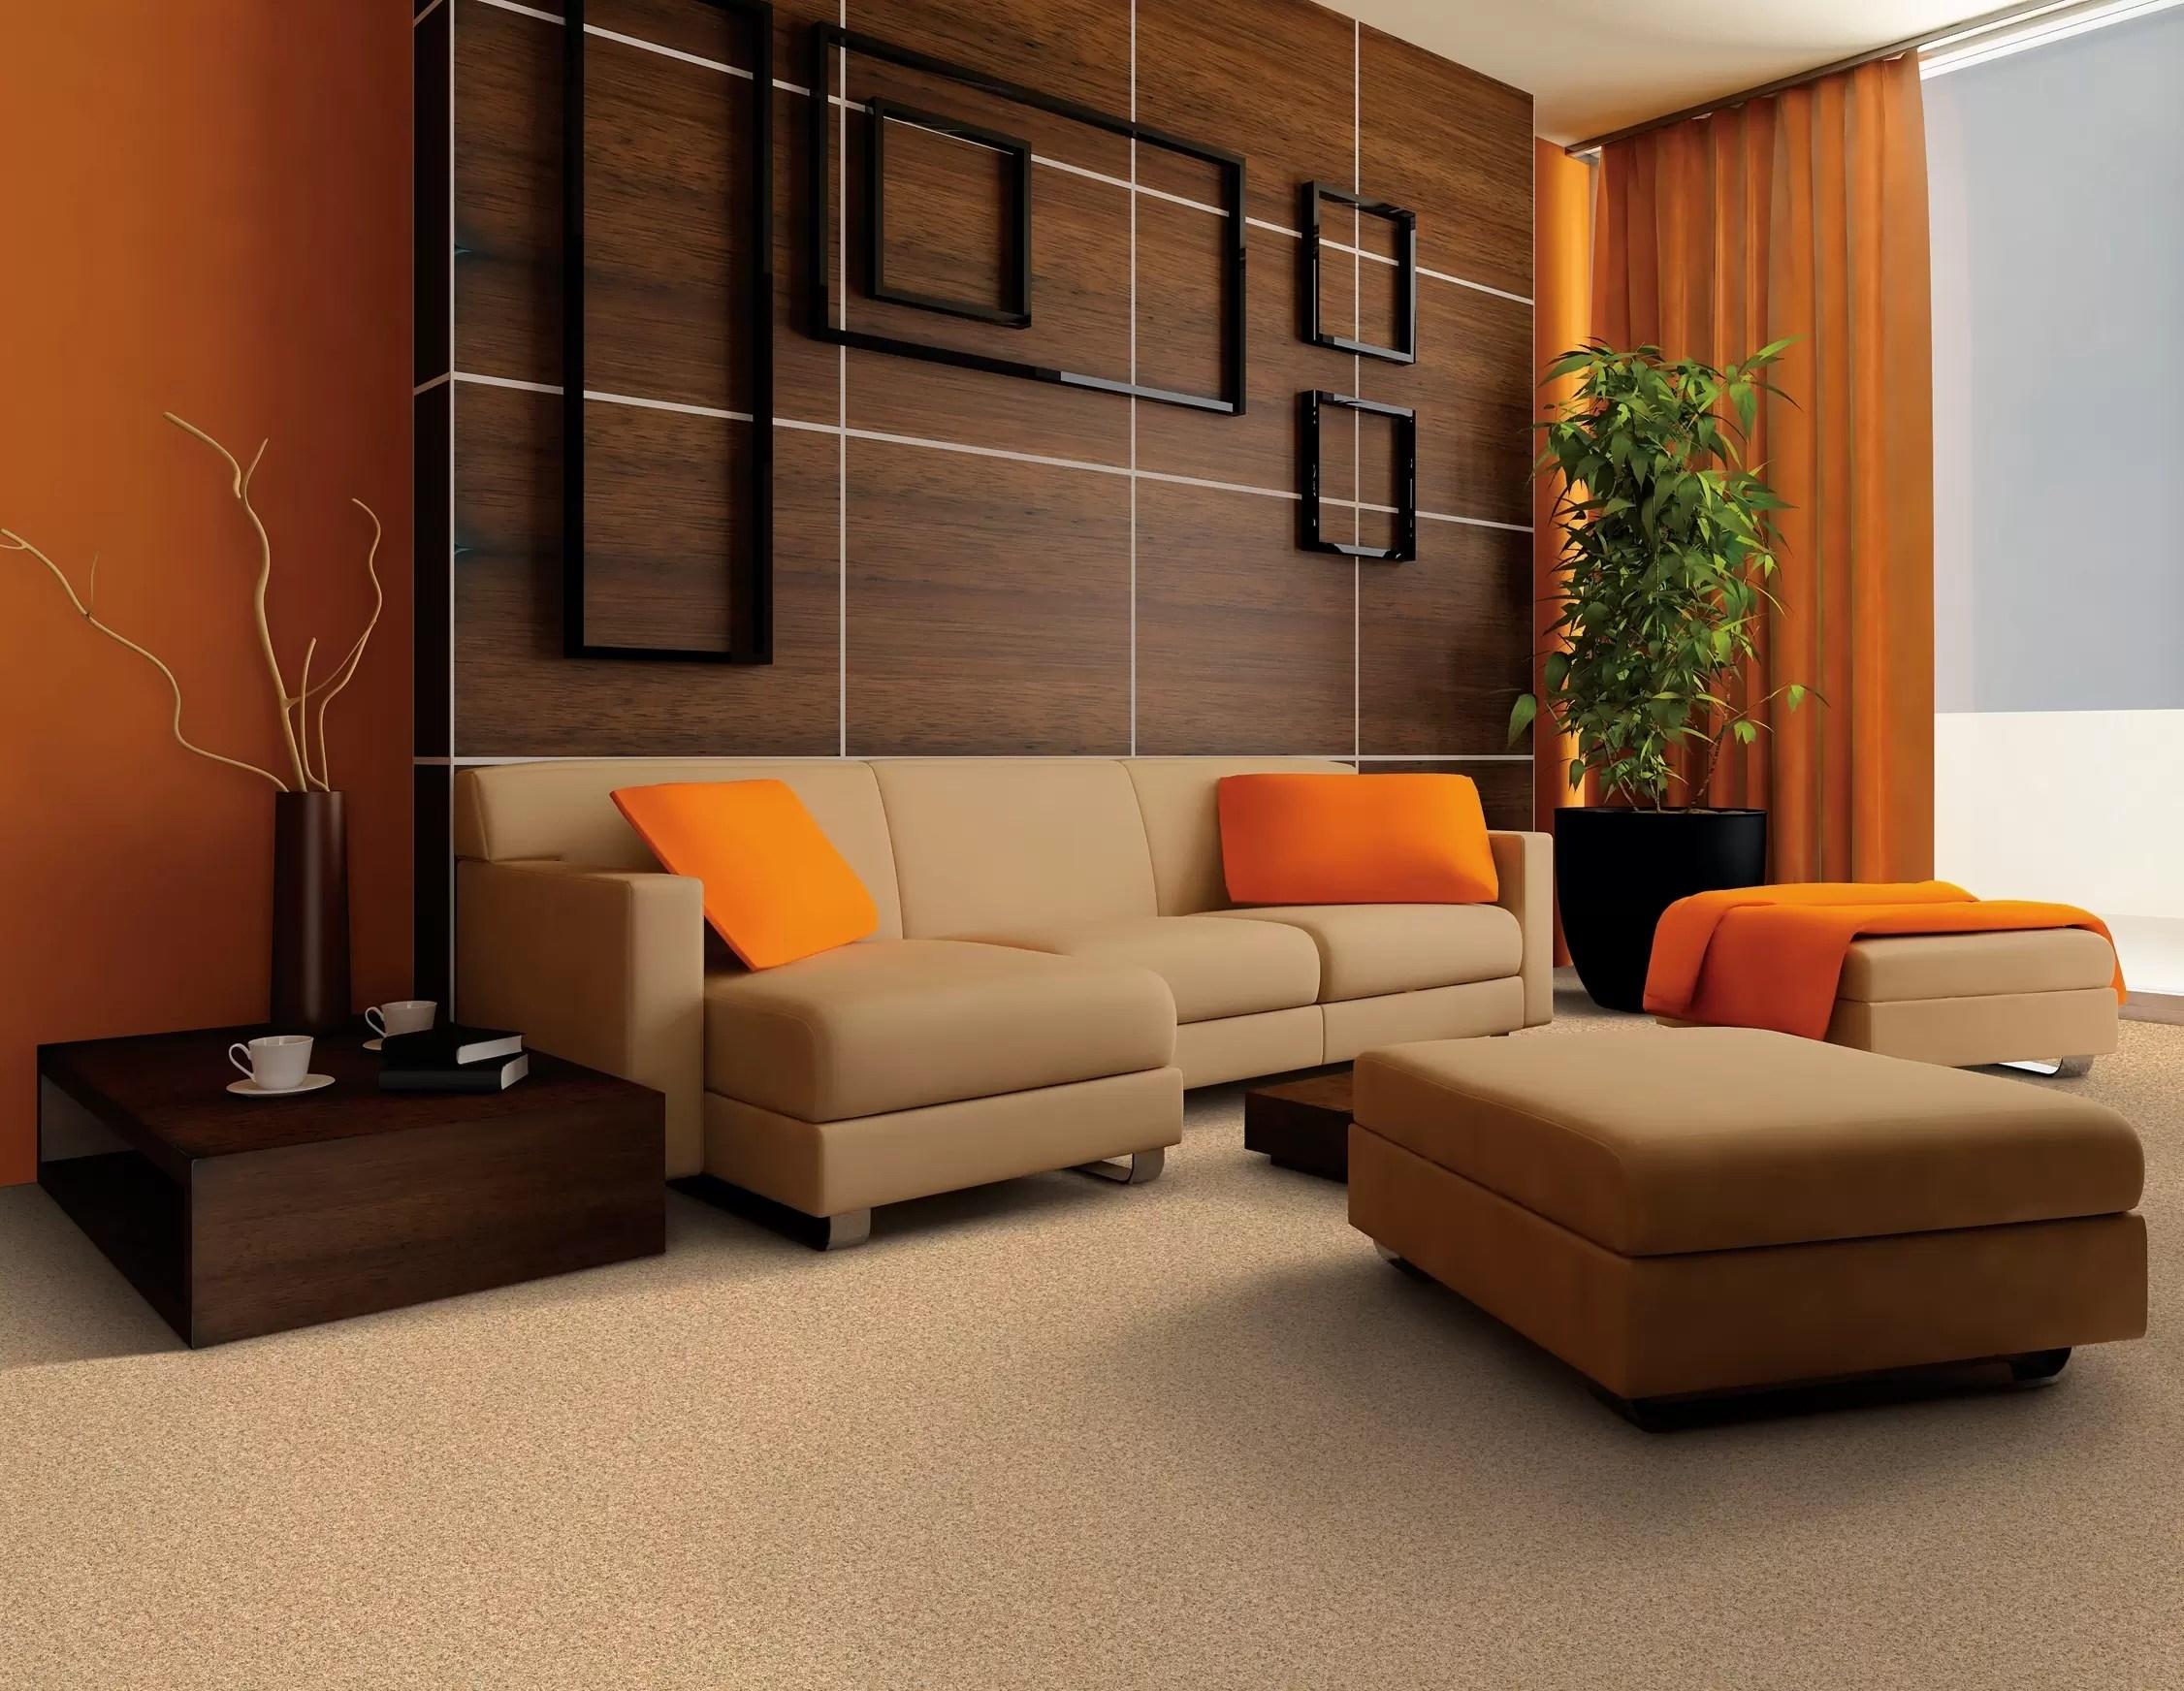 Most Common Interior Design Living Room Mistakes to Avoid  CozyHouzecom